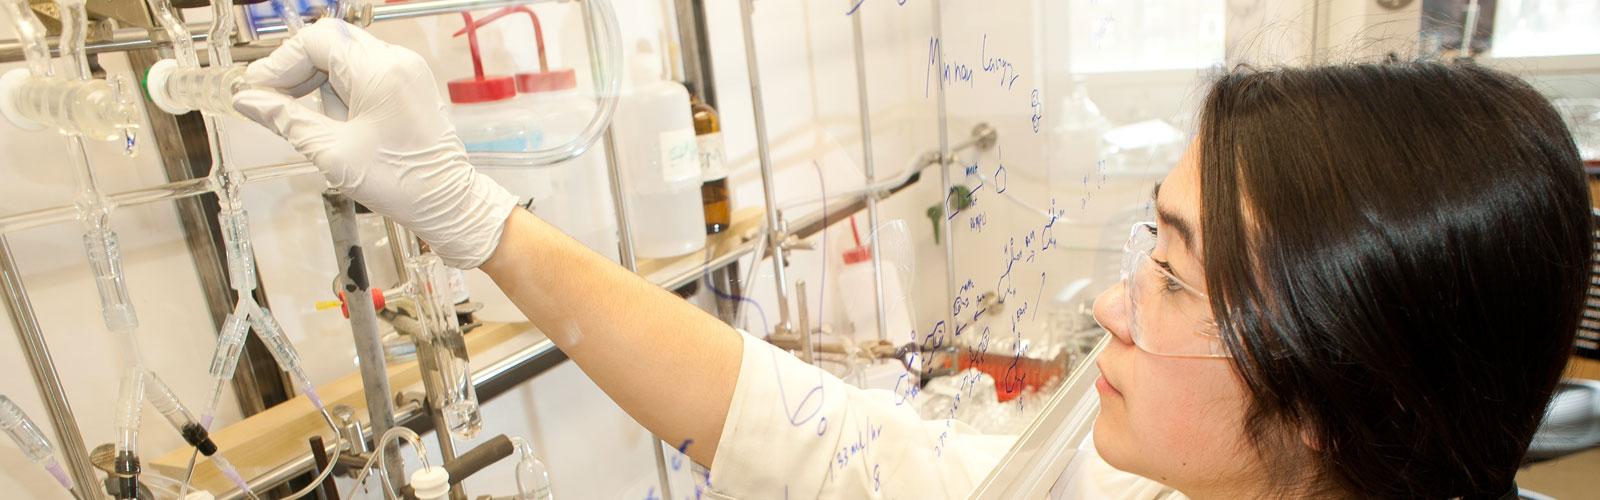 woman examining test tubes